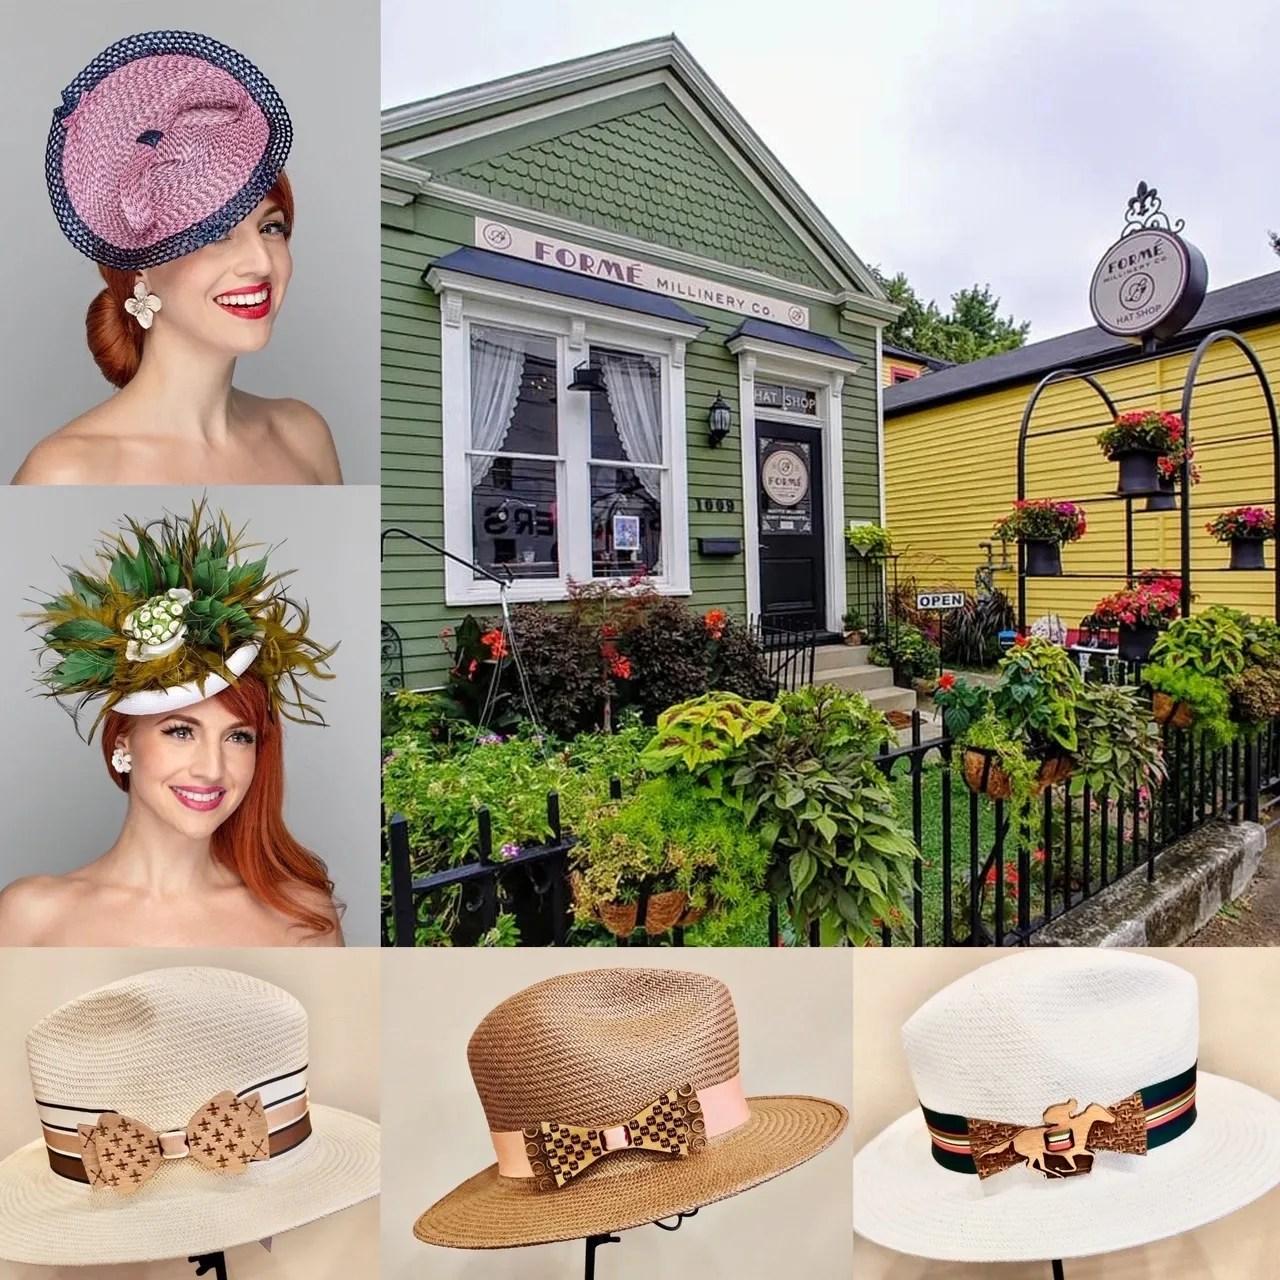 Forme Millinery Co Milliner Handmade Hats